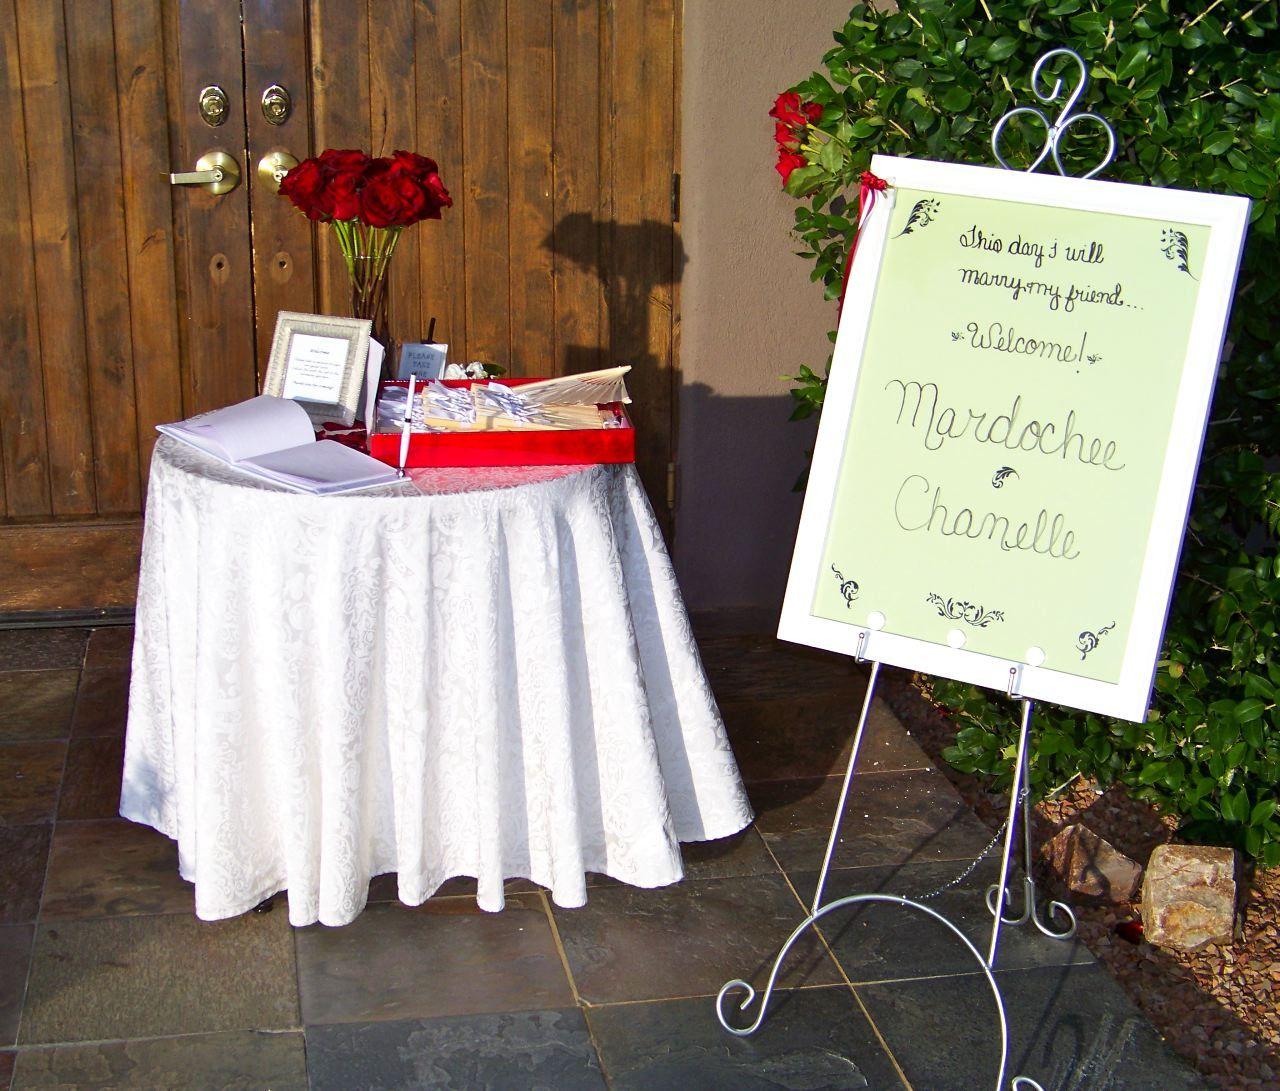 Wedding greeting table wedding stuff pinterest wedding wedding greeting table m4hsunfo